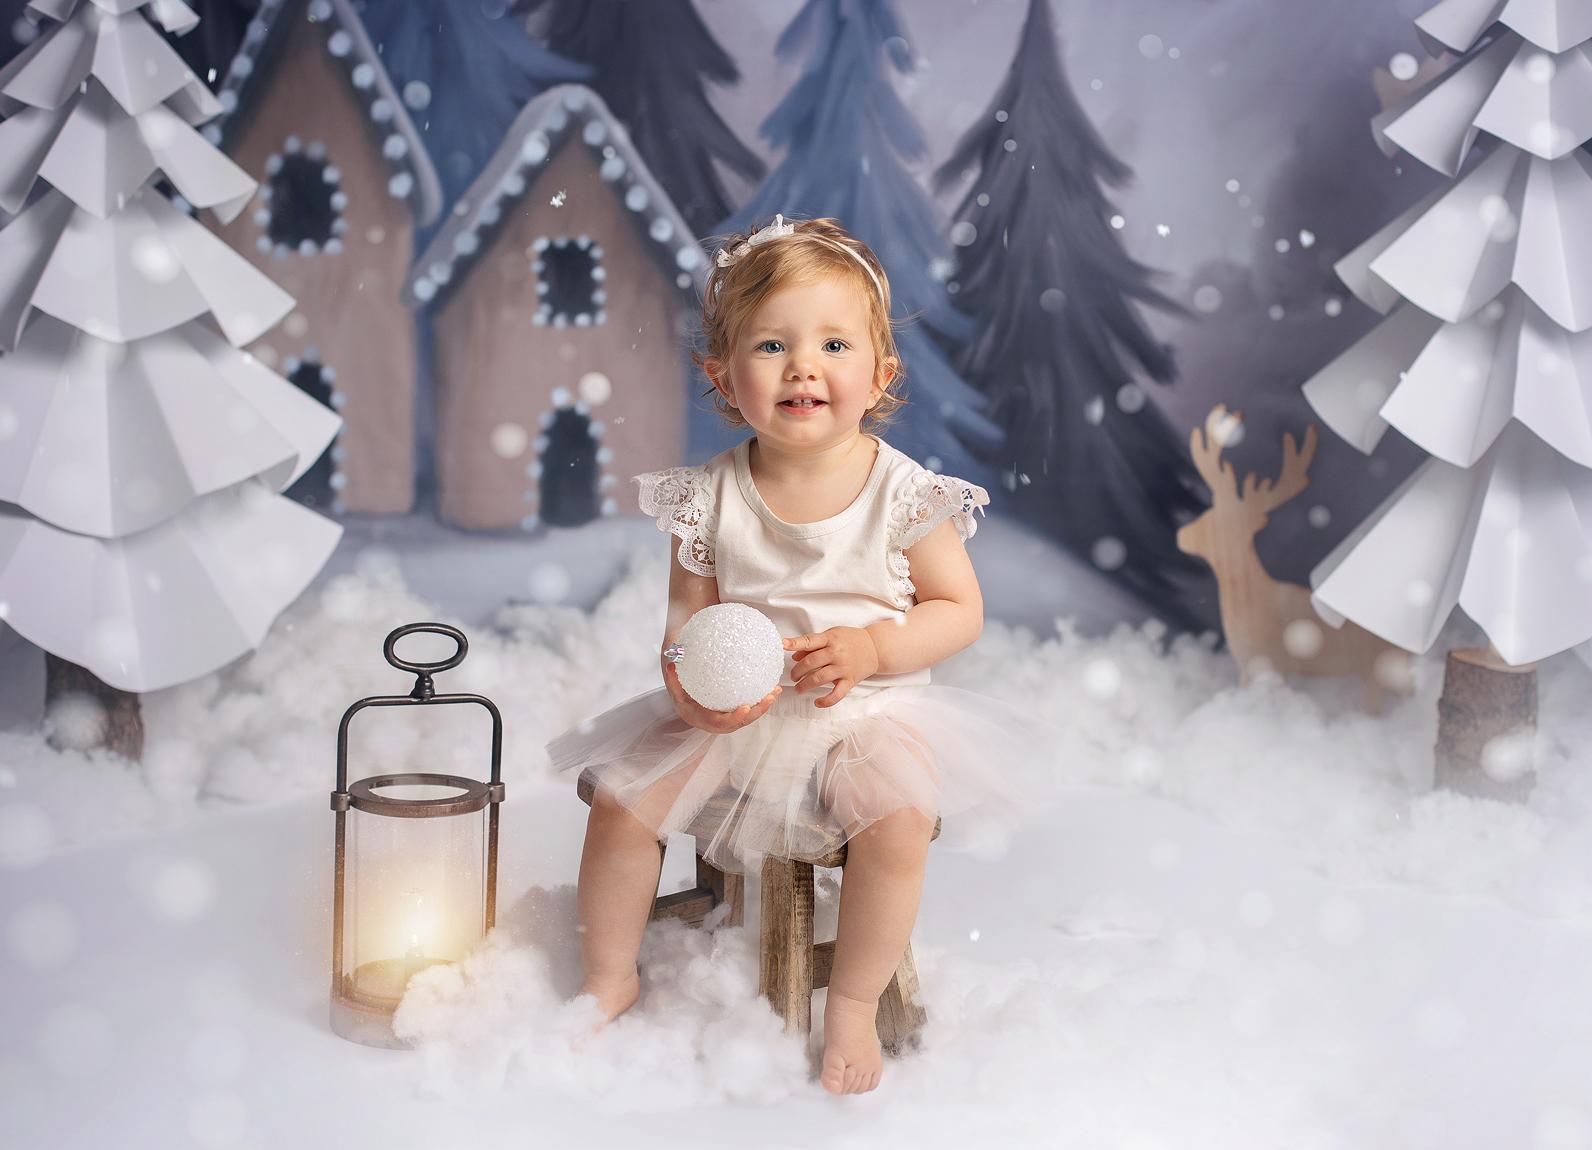 Weihnachtsshooting Xmas mini Session 2021 Christmas